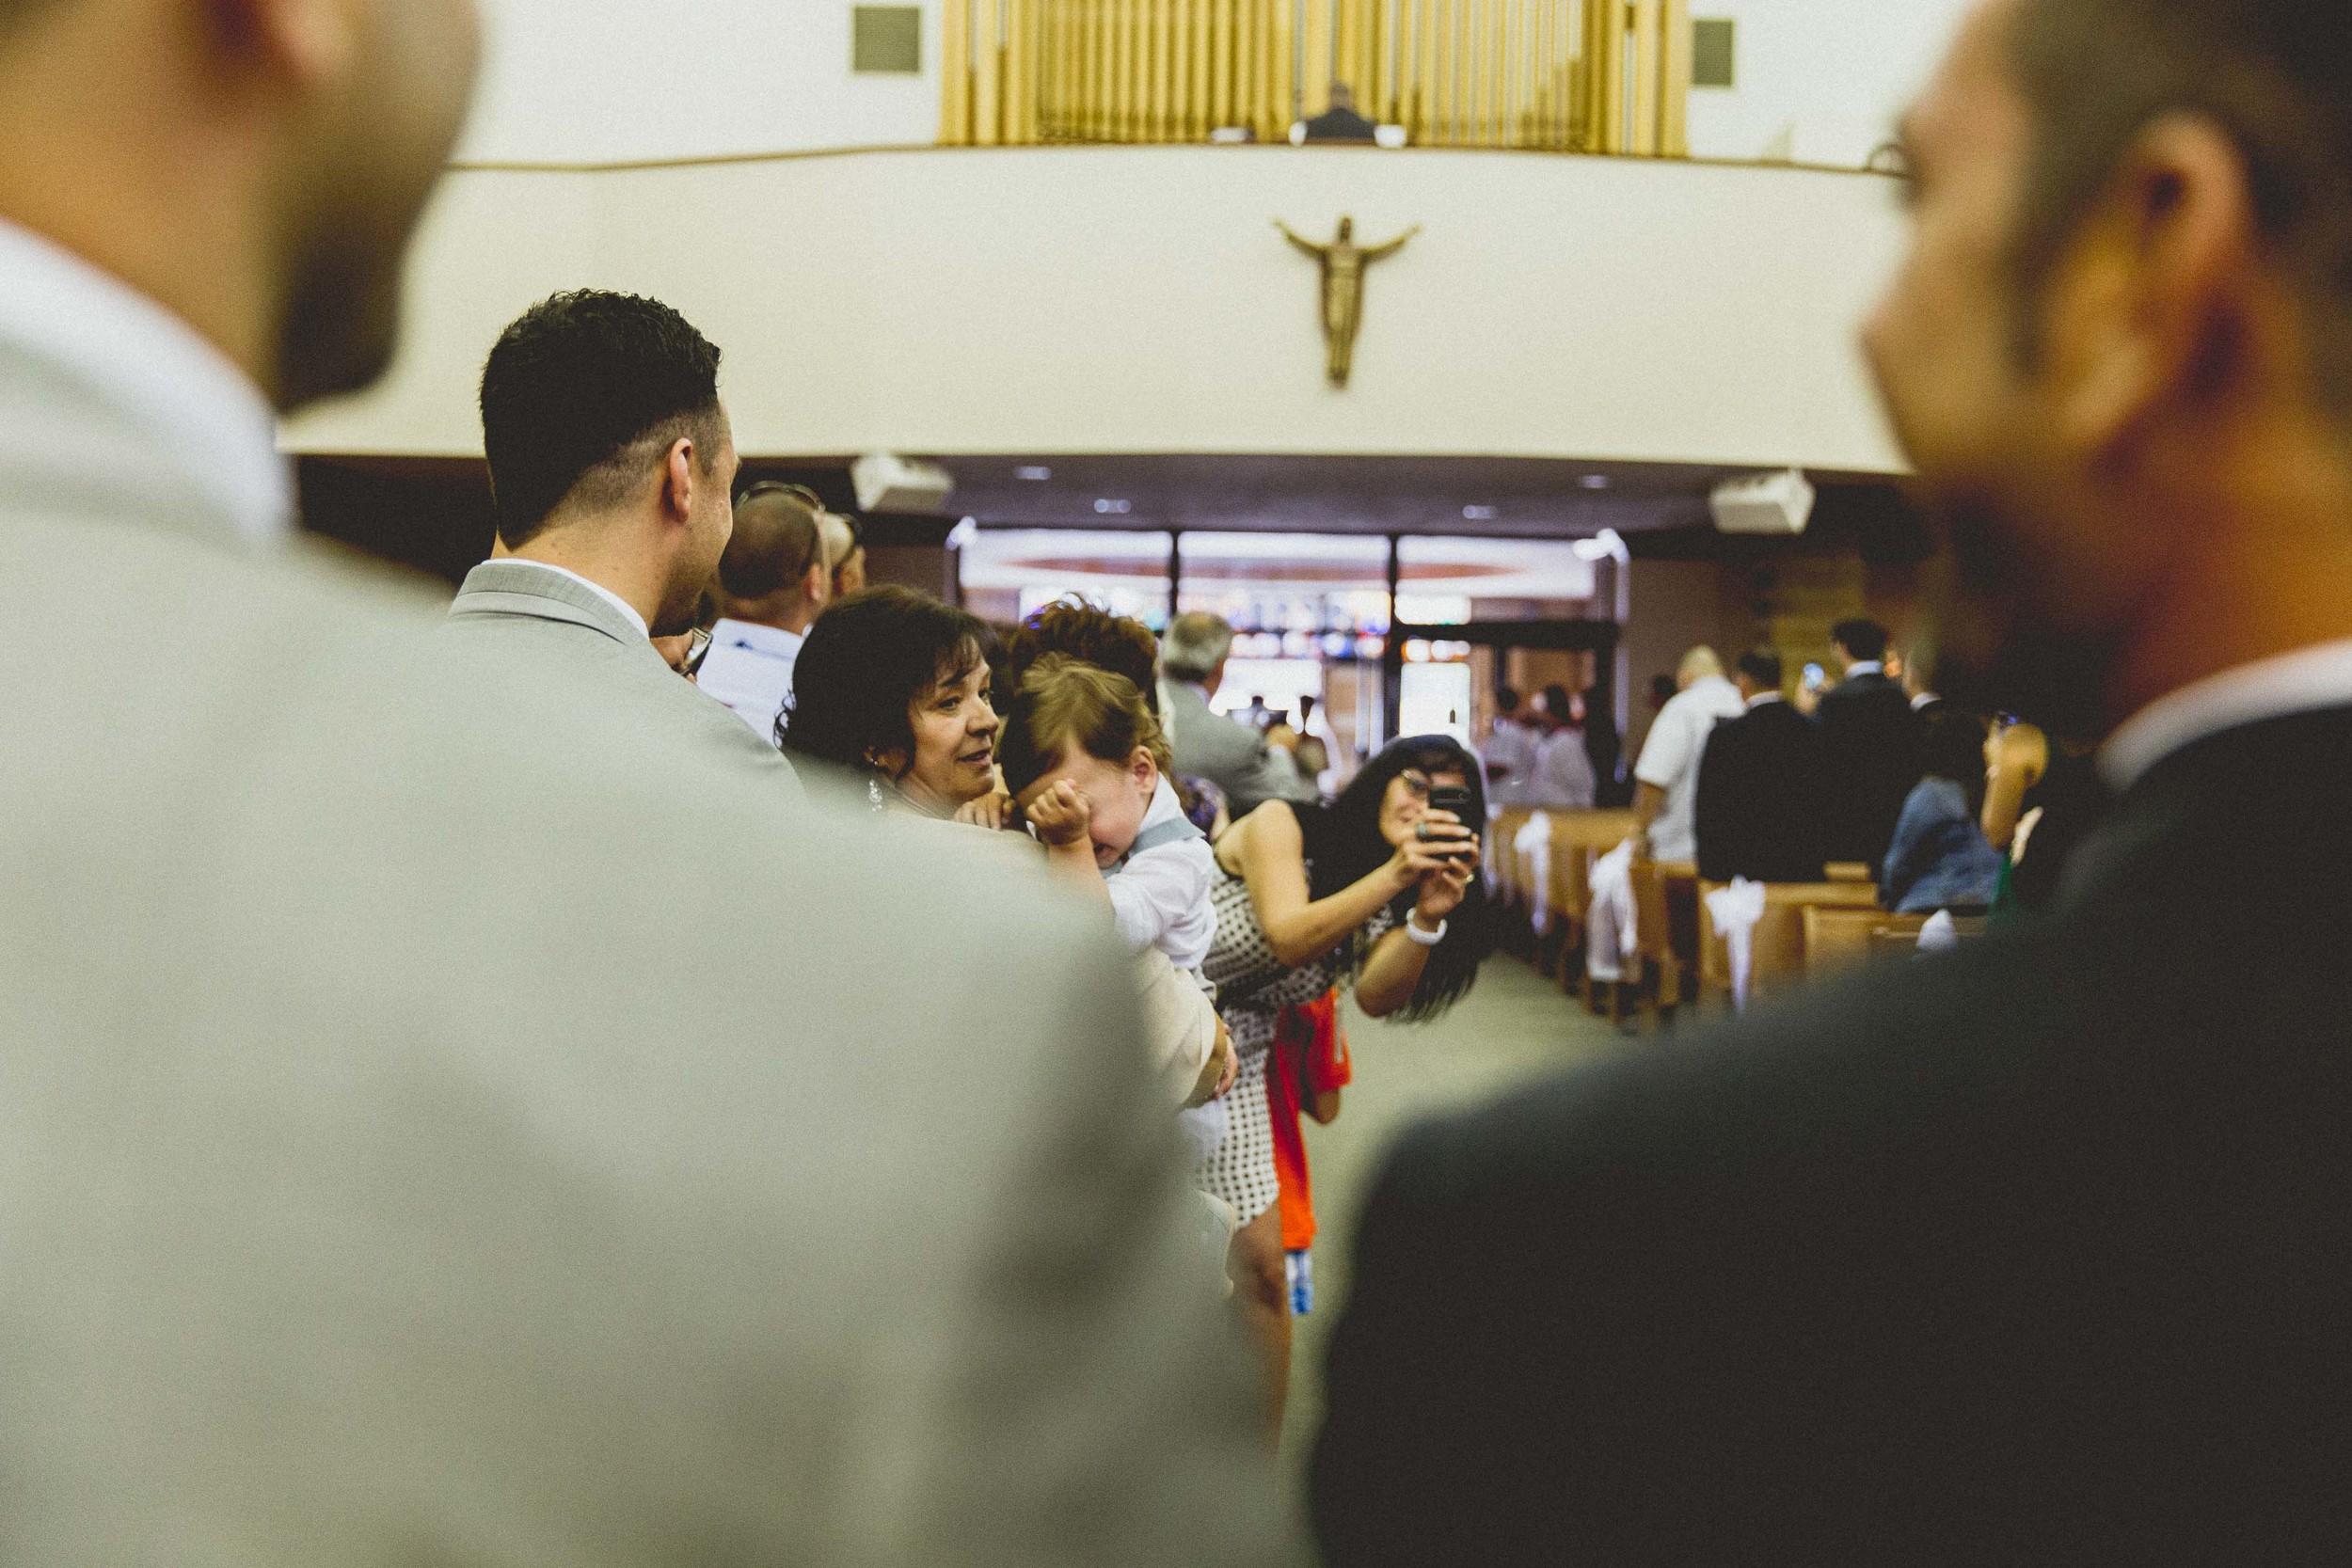 Toronto Wedding Photography | Caterina & Elvis, Pickering catholic wedding (33 of 39).jpg